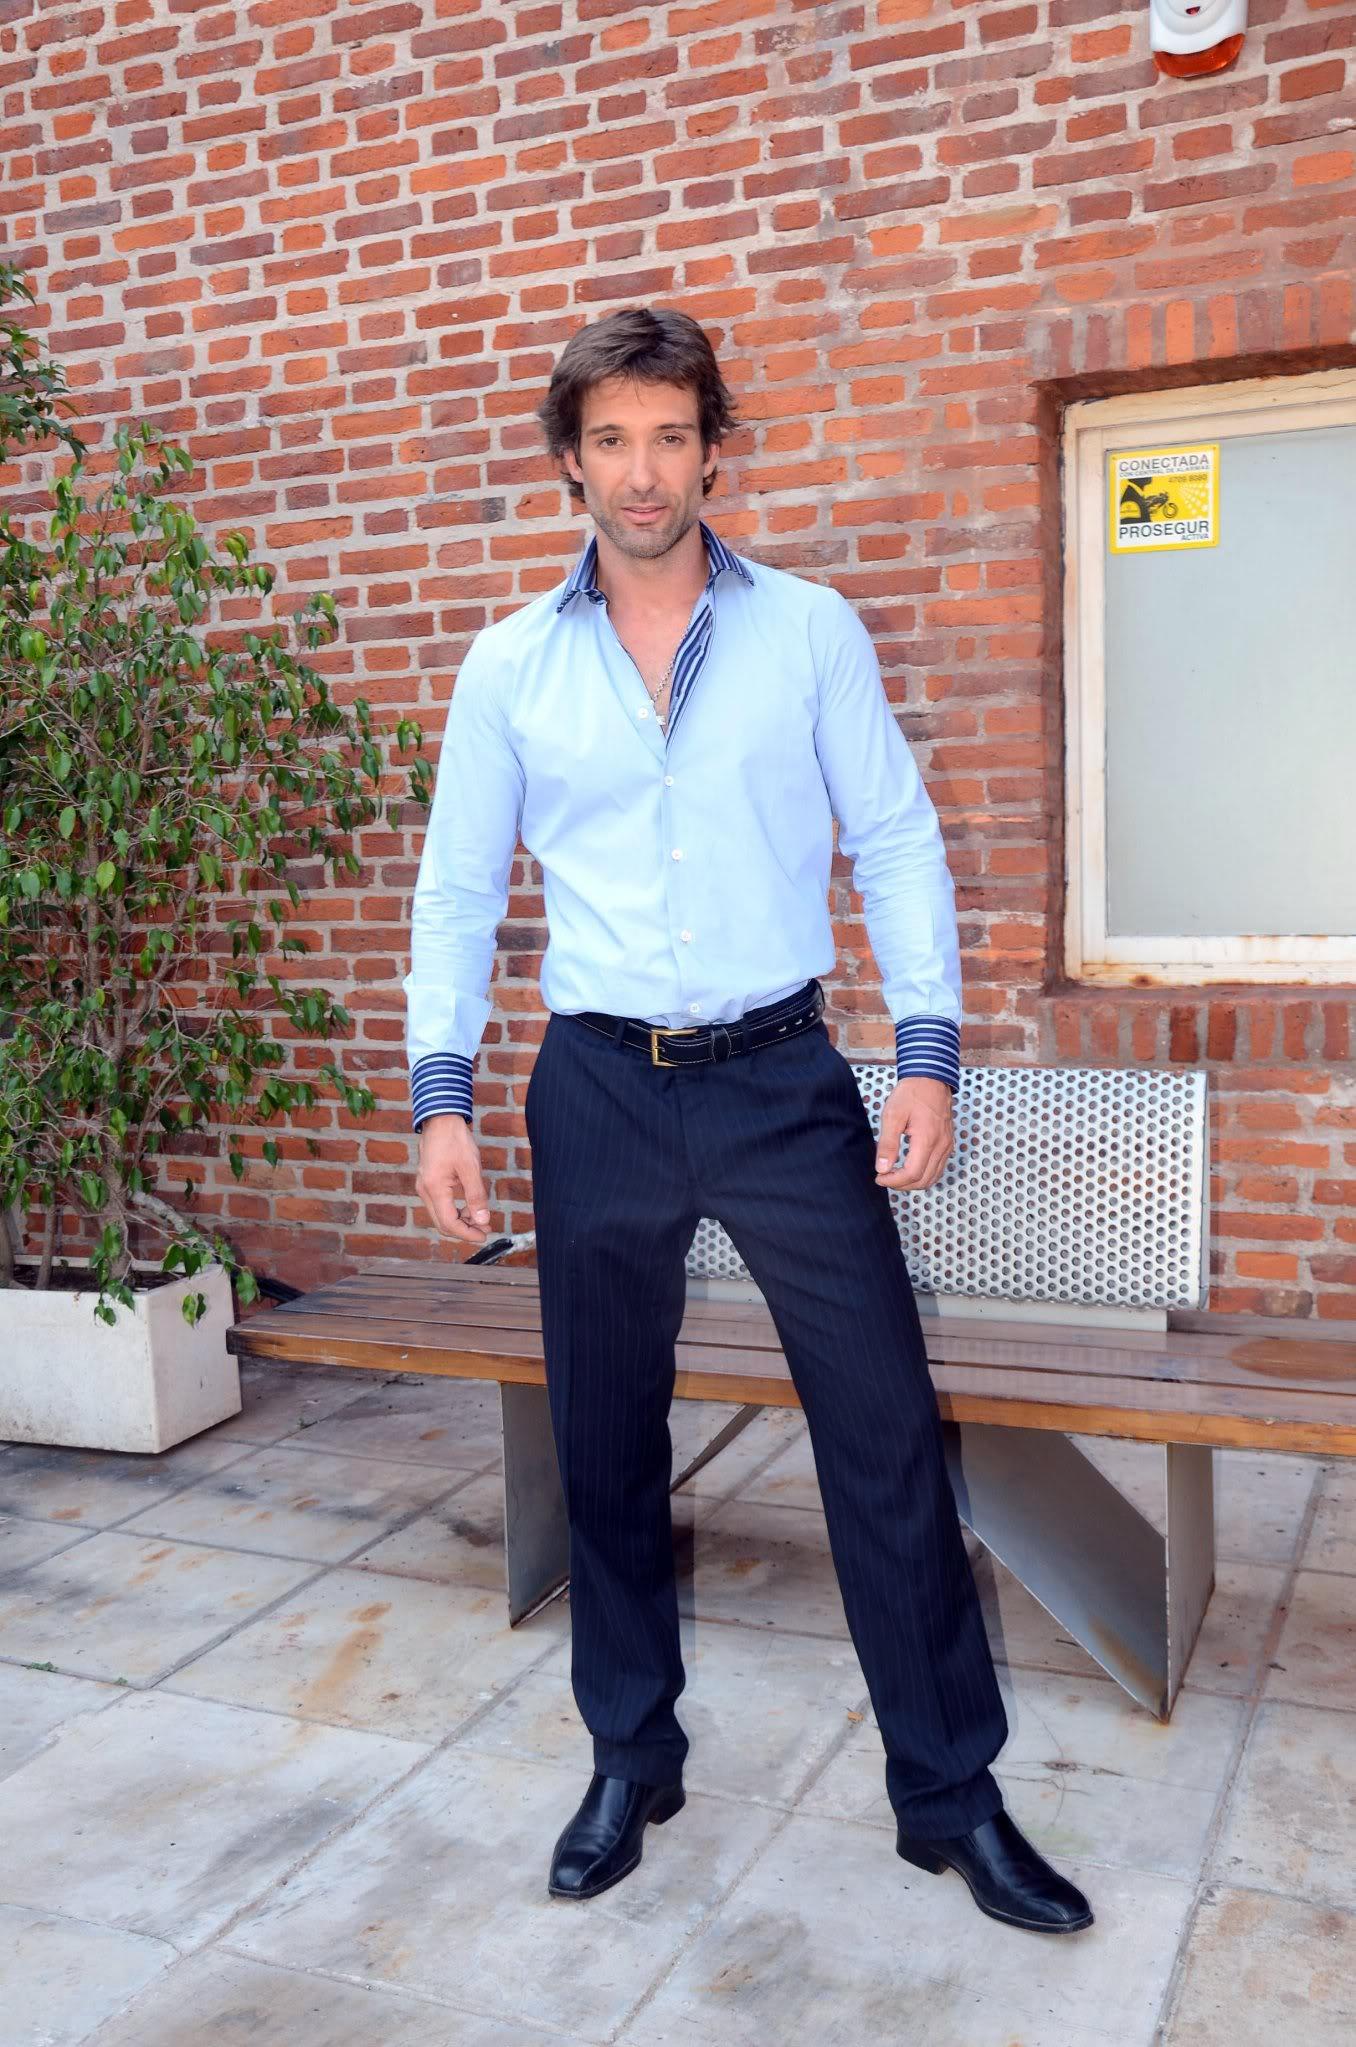 Аргентинские теленовеллы 2012 - Página 8 511439840